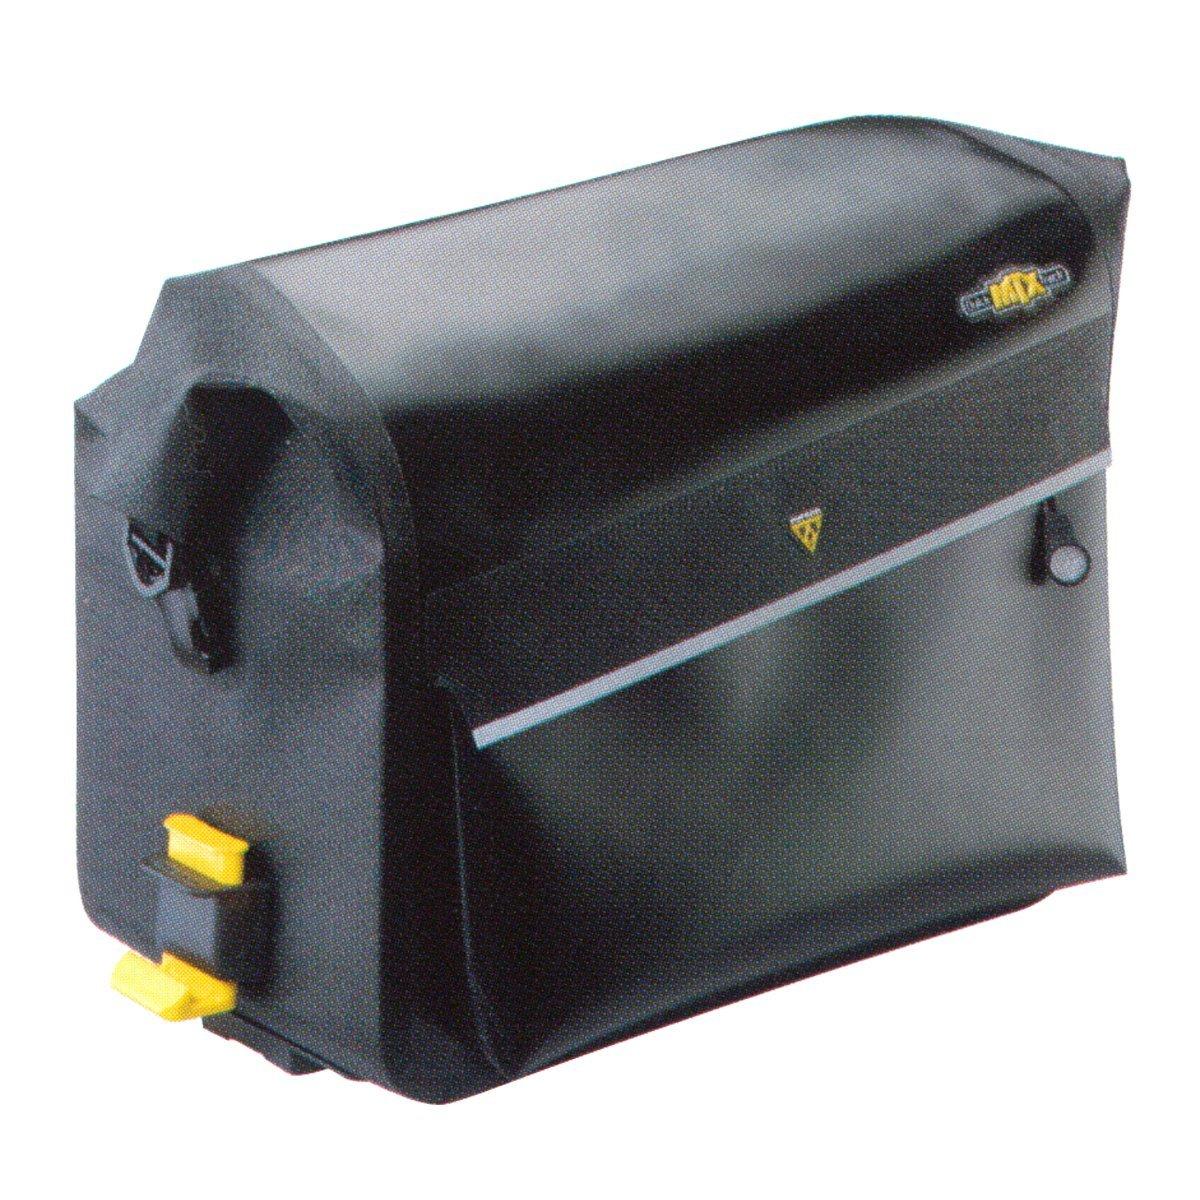 Topeak Gepäcktasche amazon